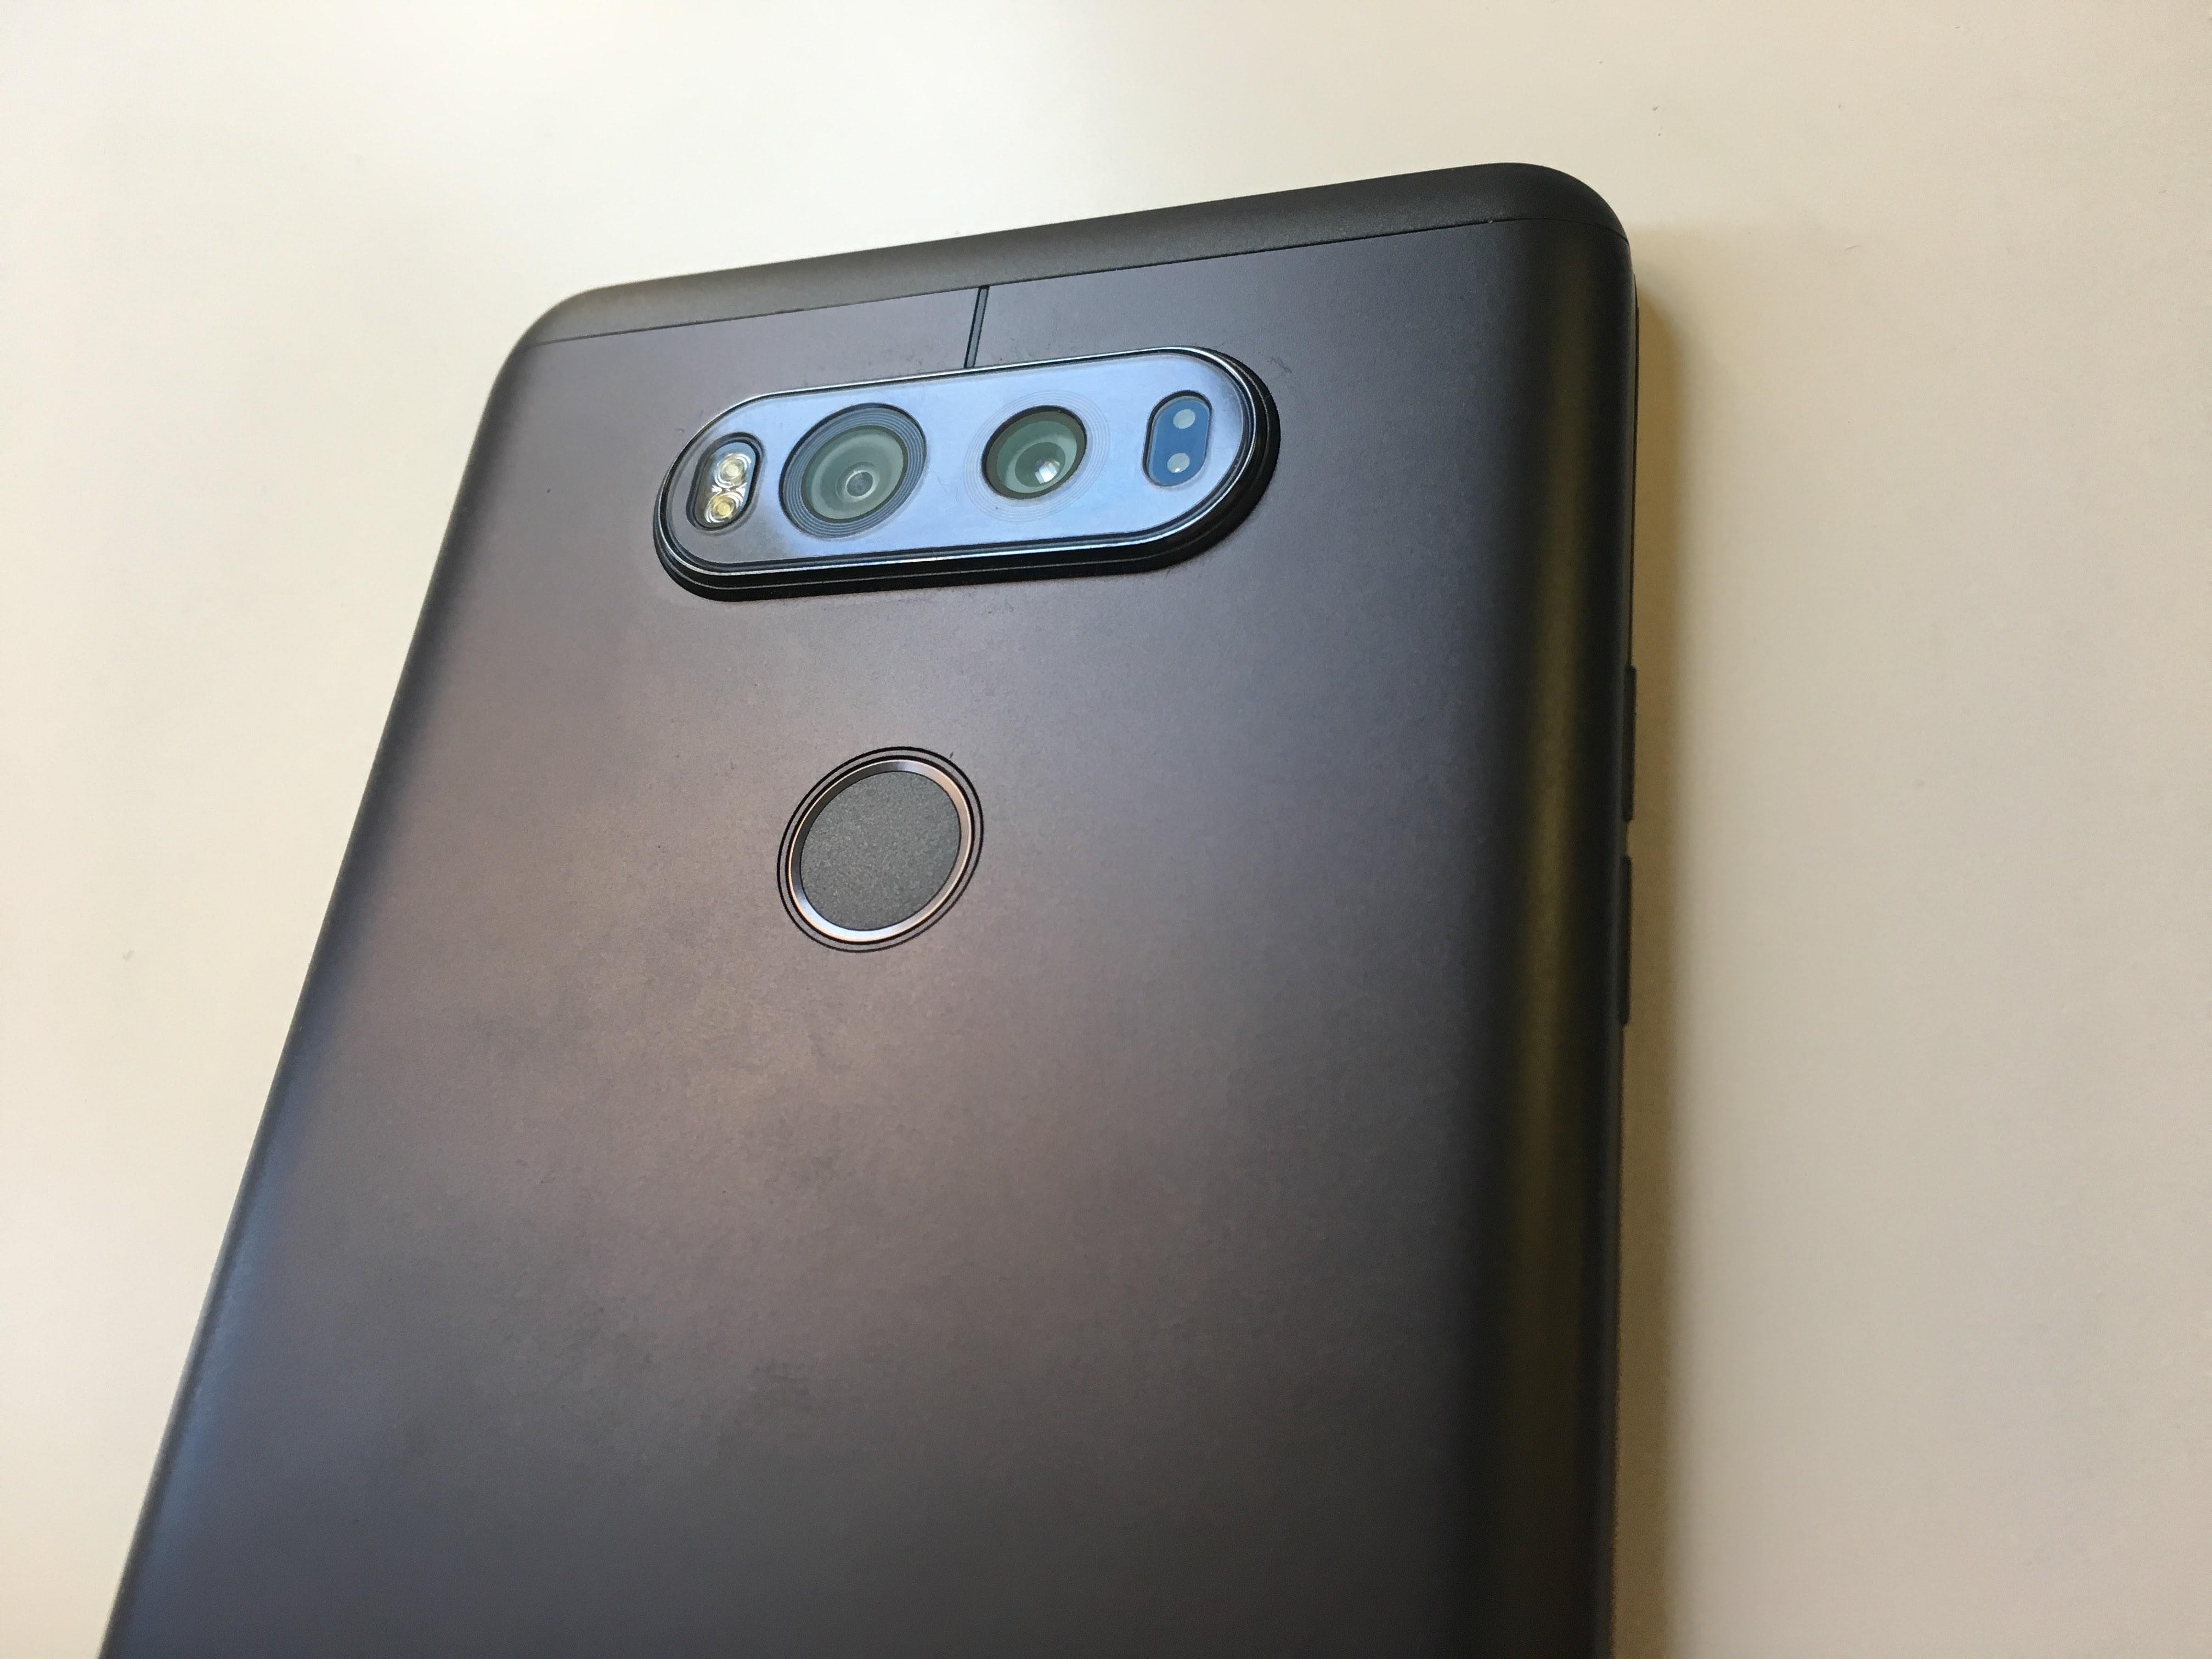 The dual cameras on LG's V20.